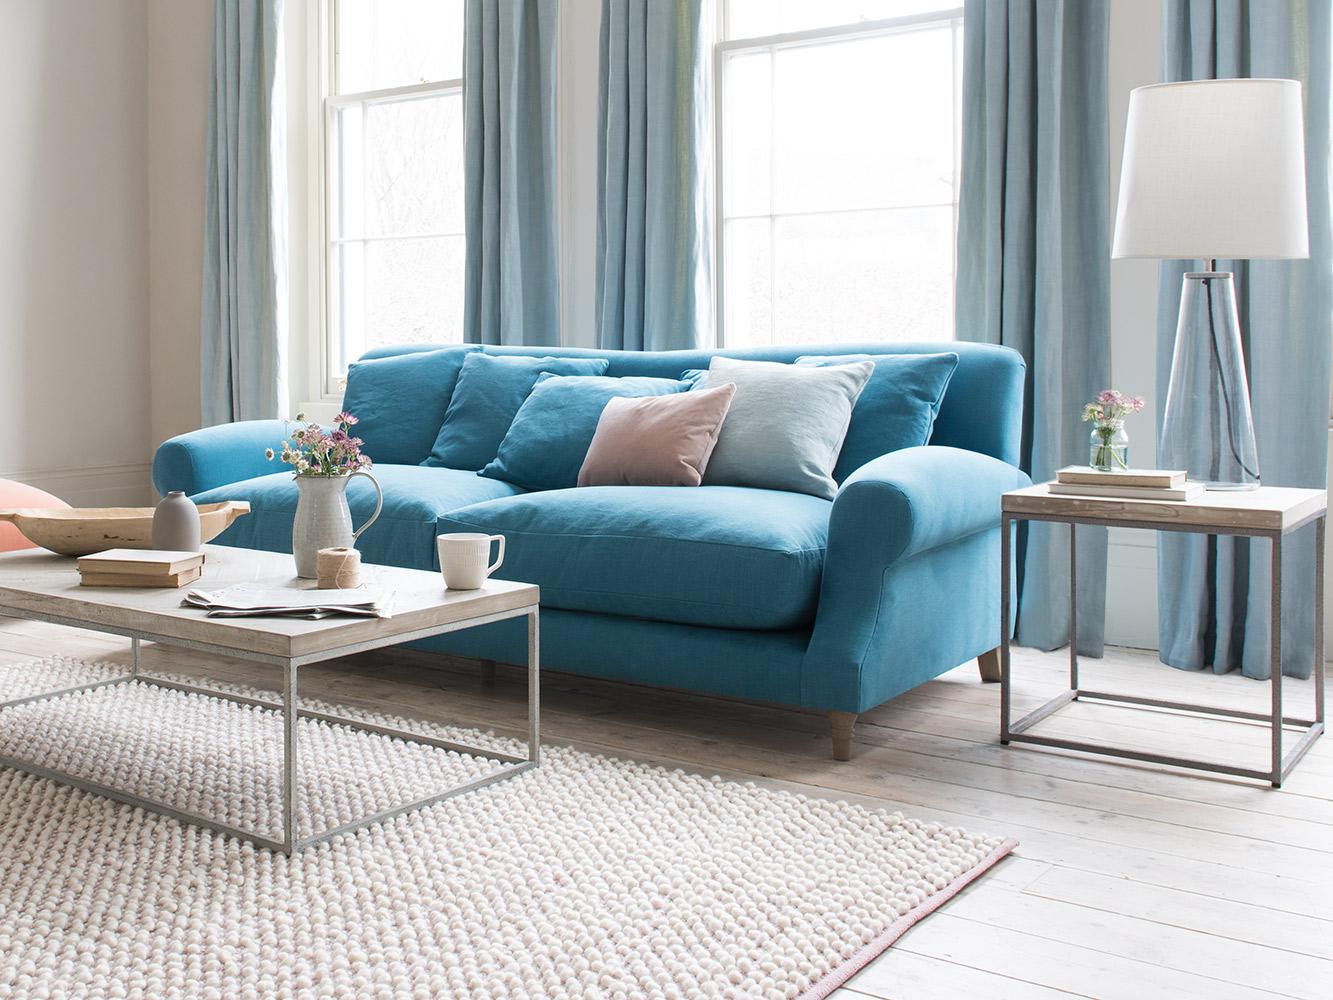 Crumpet Sofa Extra Deep Clic